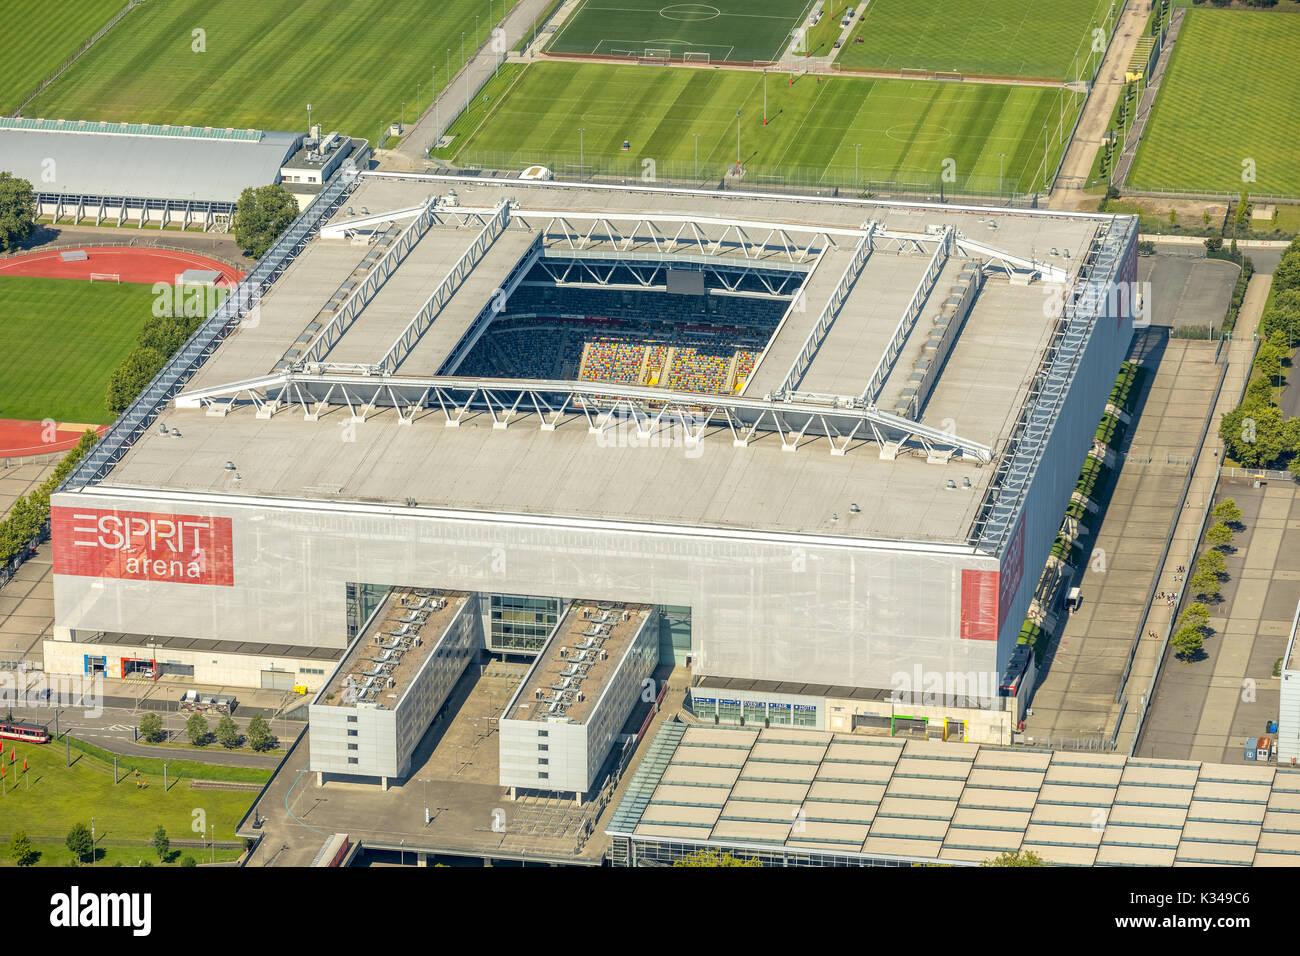 Düsseldorf Kongress Sport Event Gmbh Esprit Arena Düsseldorf